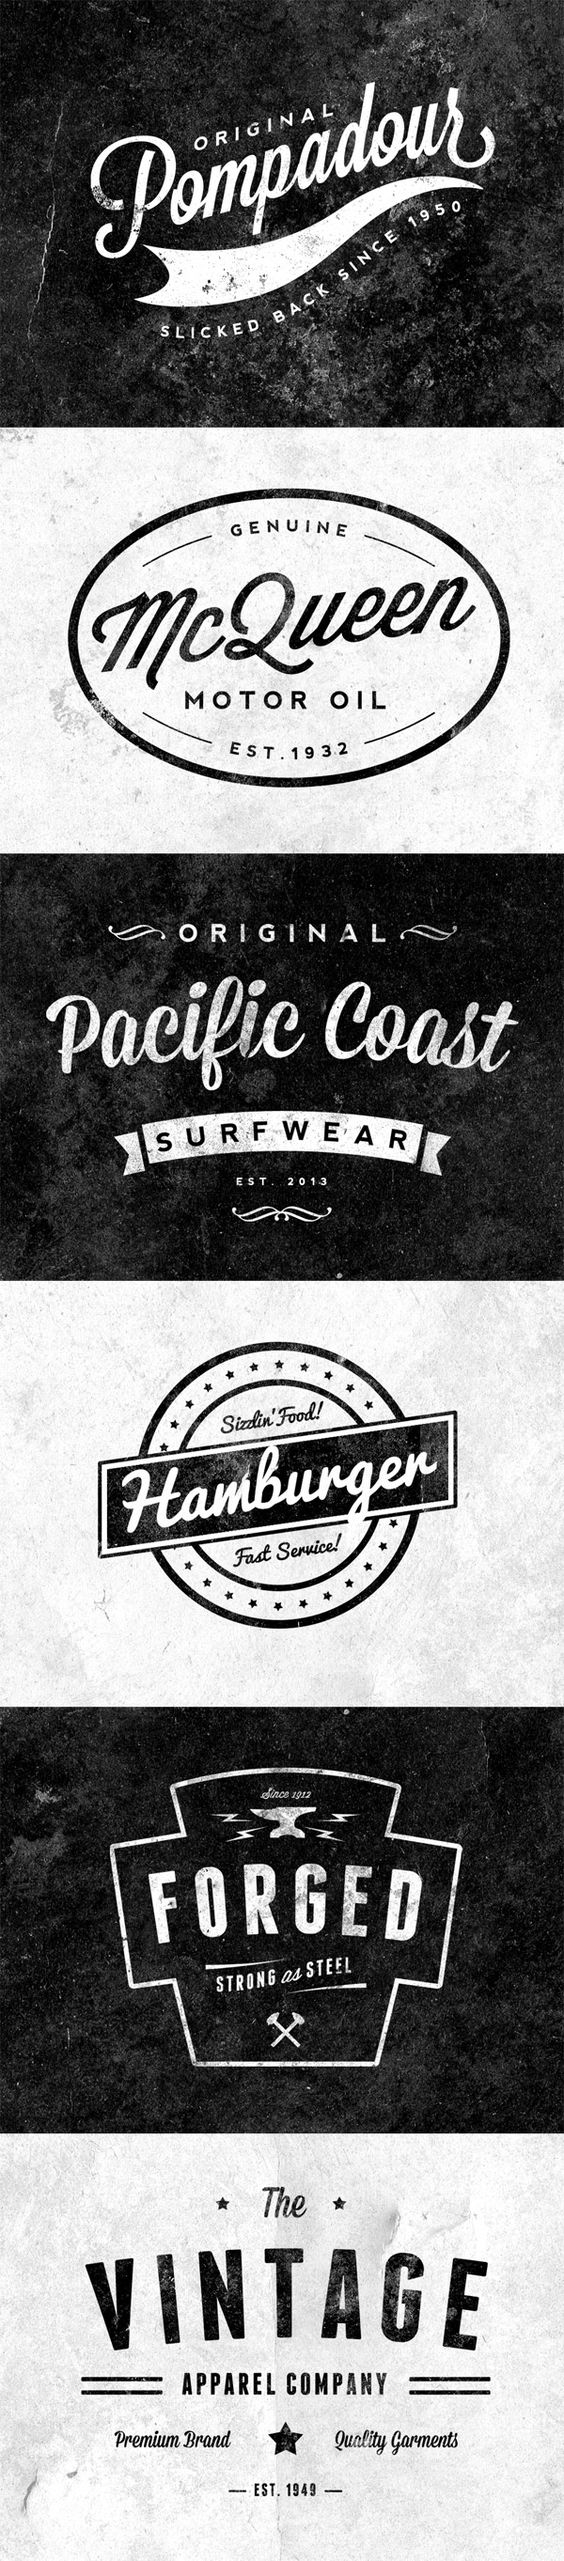 6 Free Customizable Retro/Vintage Logos & Emblems